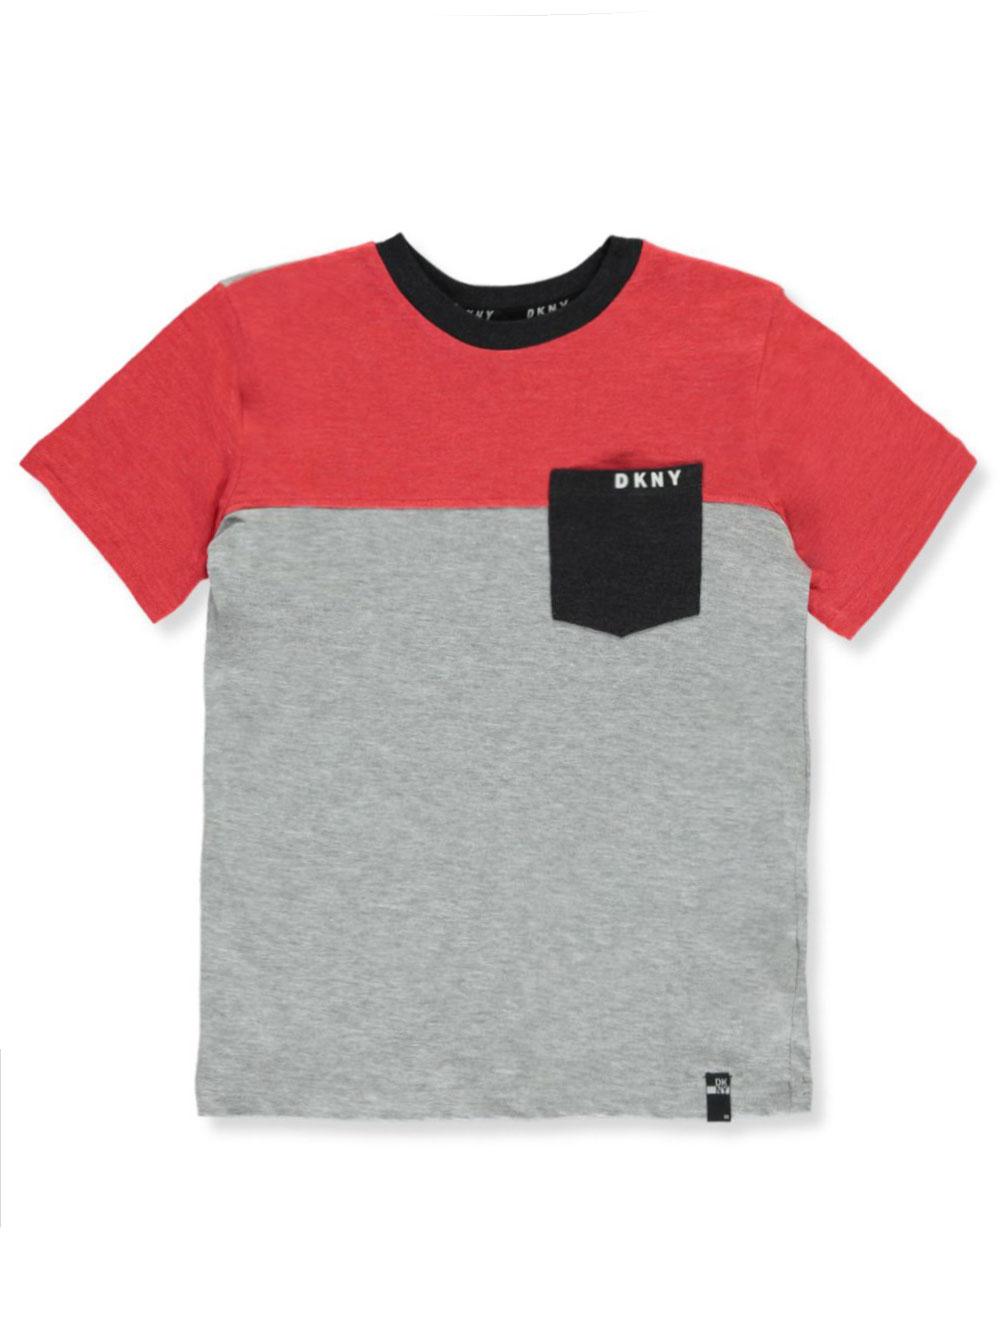 DKNY Boys T-Shirt